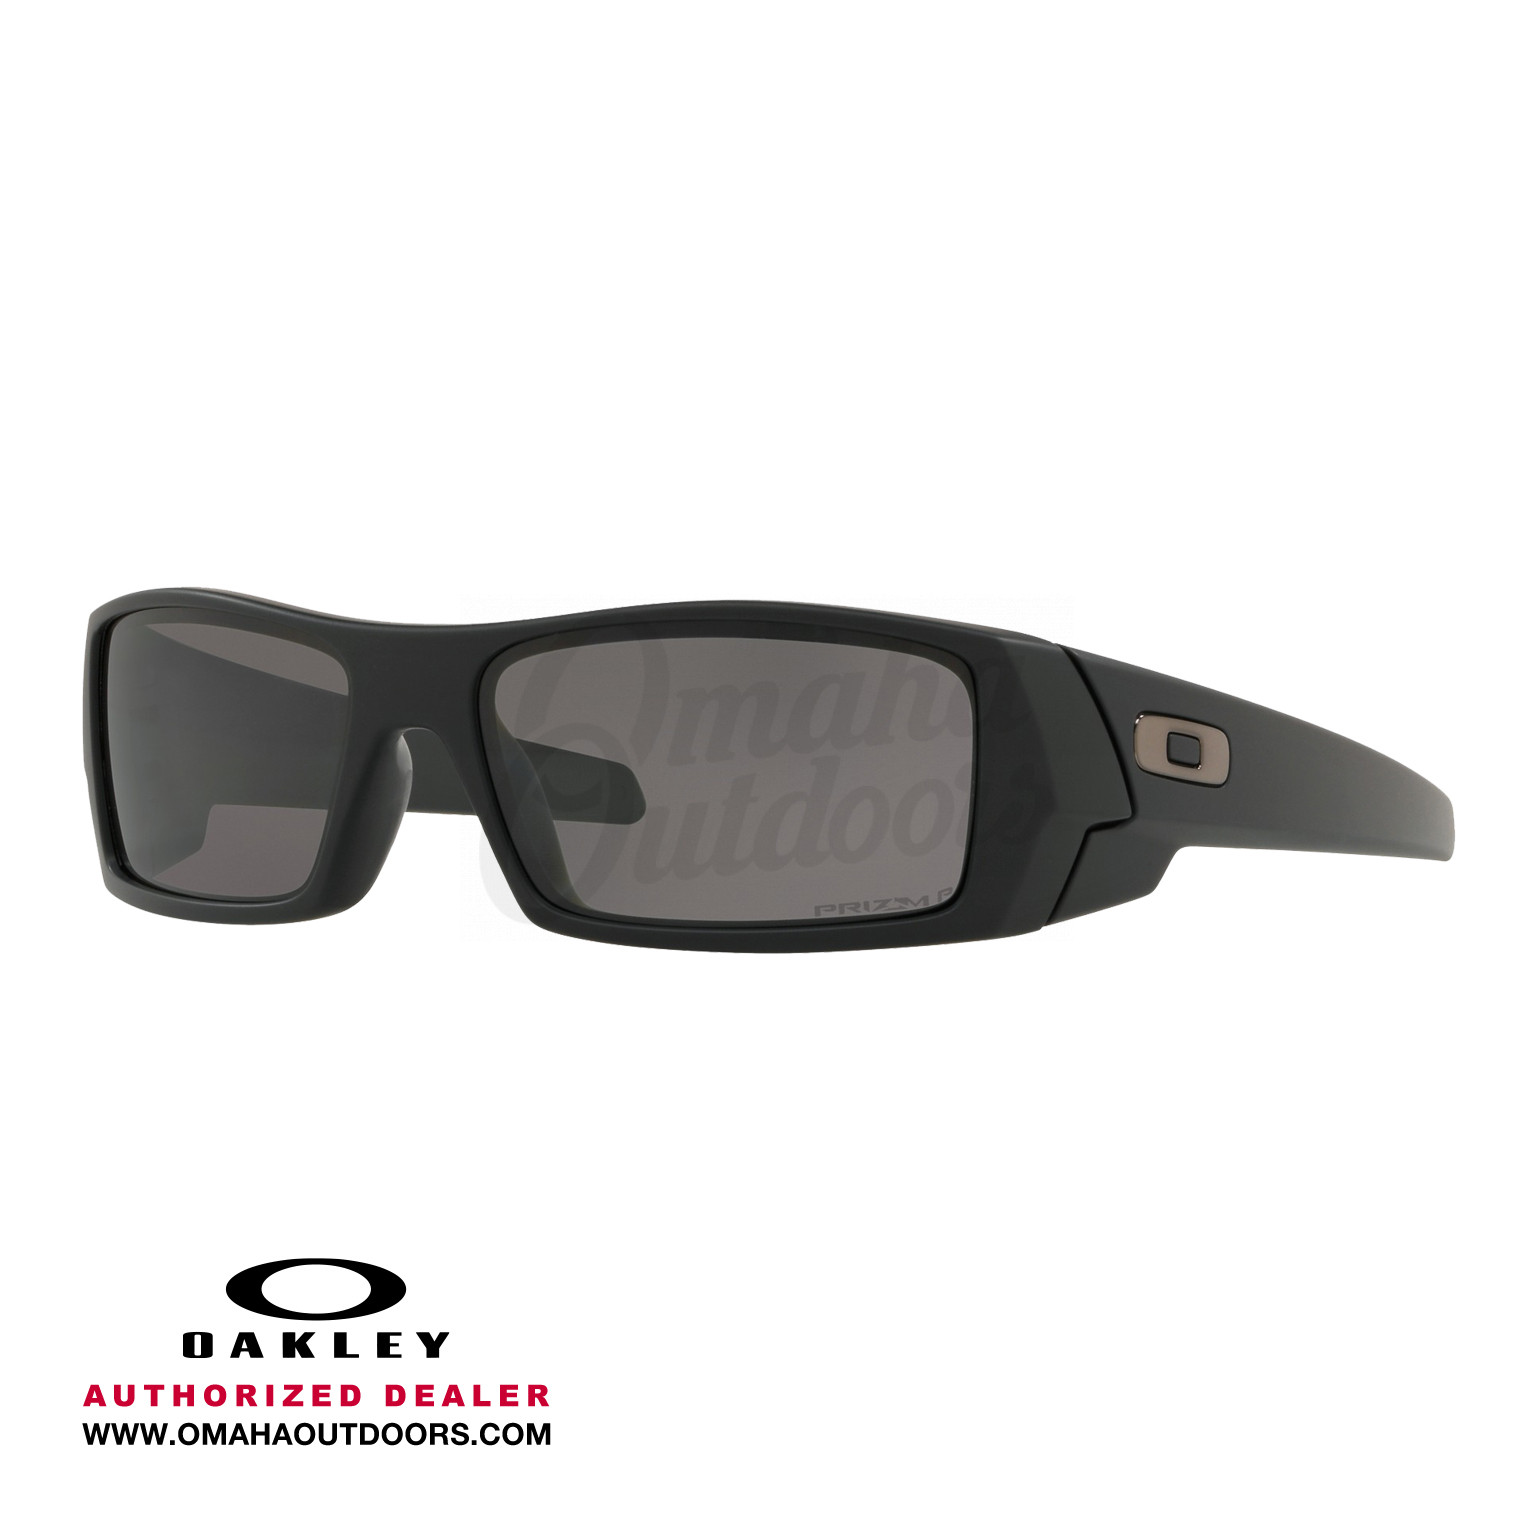 3b1308f45e Oakley SI Gascan Uniform Sunglasses Prizm Gray Polarized Lens ...